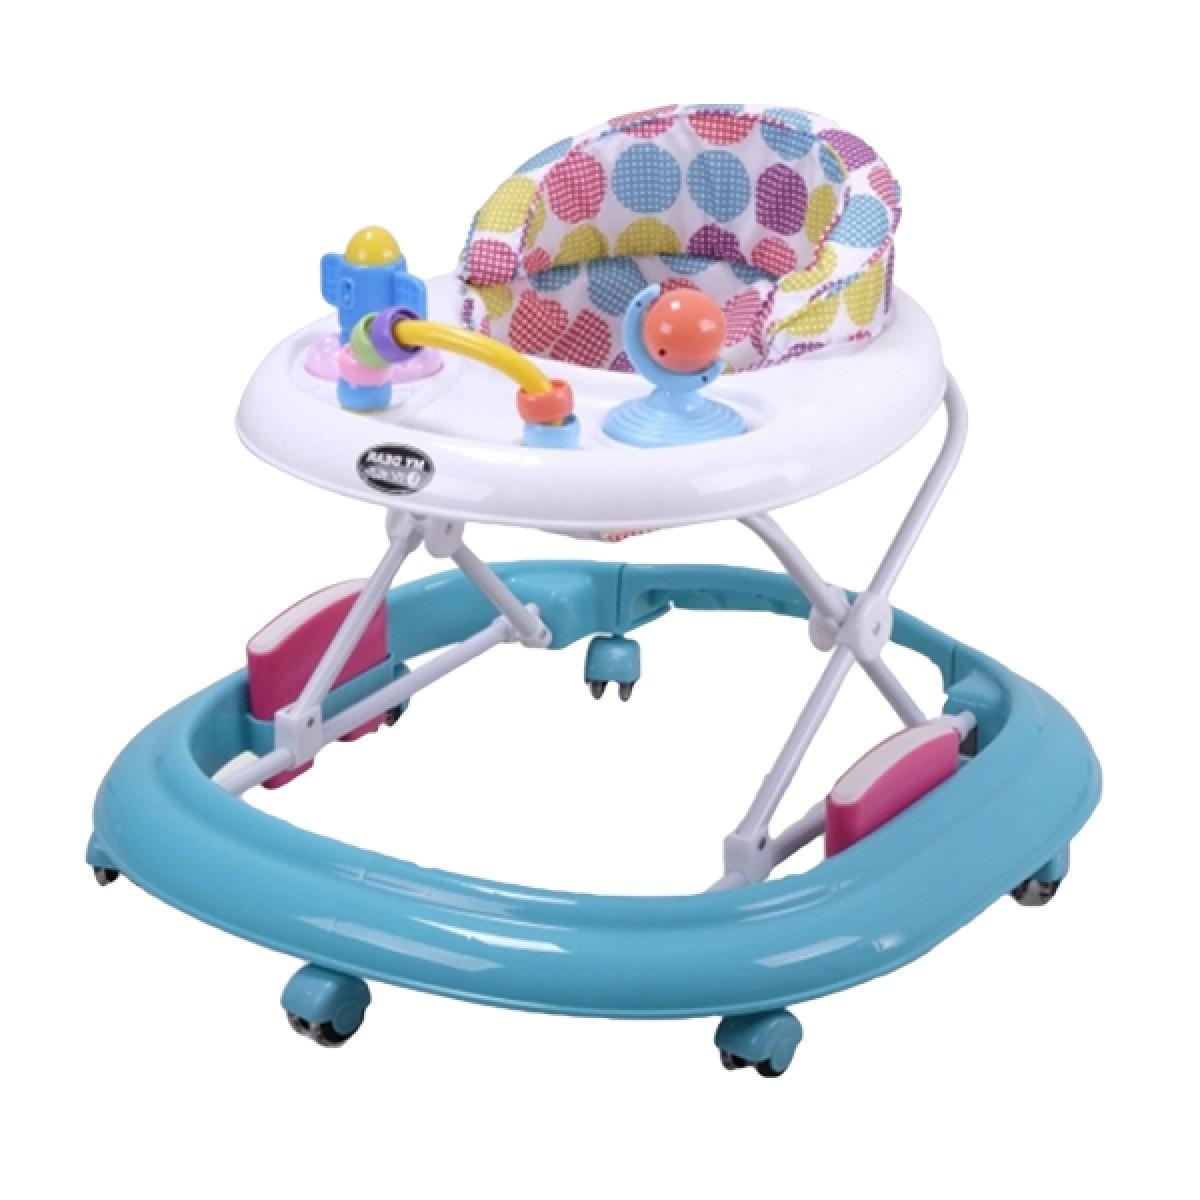 Hopea Baby Walker & Rocker - Kico Baby Center